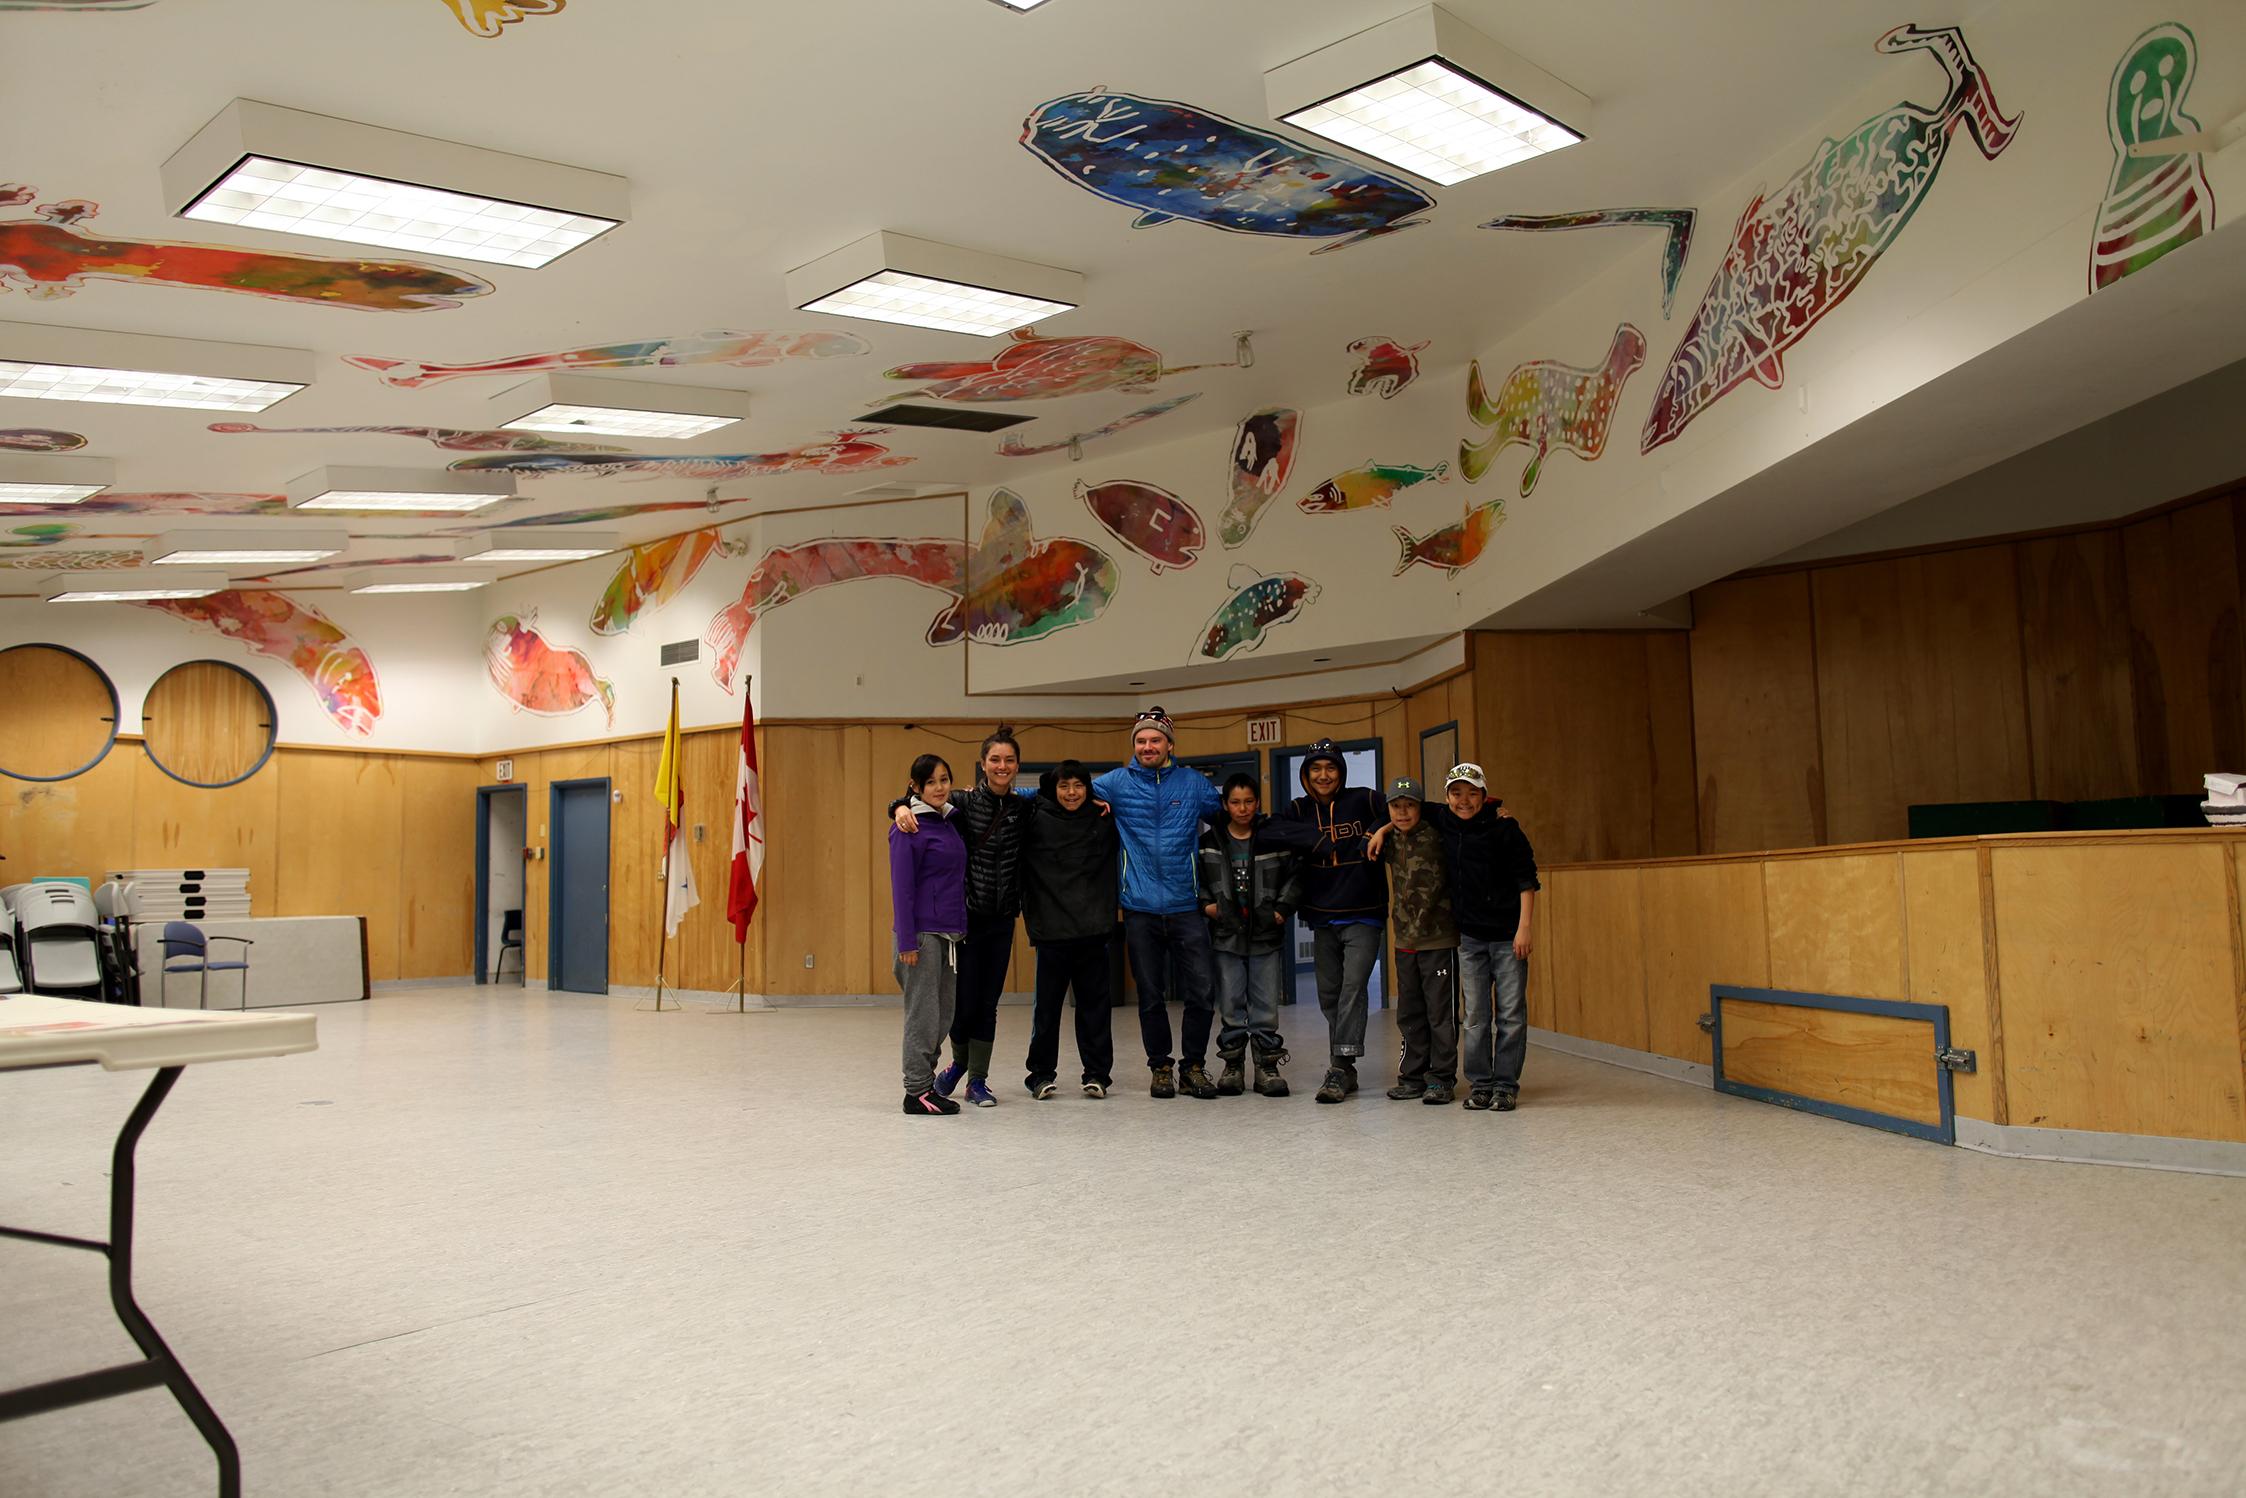 Elisapee, Alexa, Johnny, Patrick, Ezee, Cie, Saaki, Tommy: Facilitators and a few mural crew members